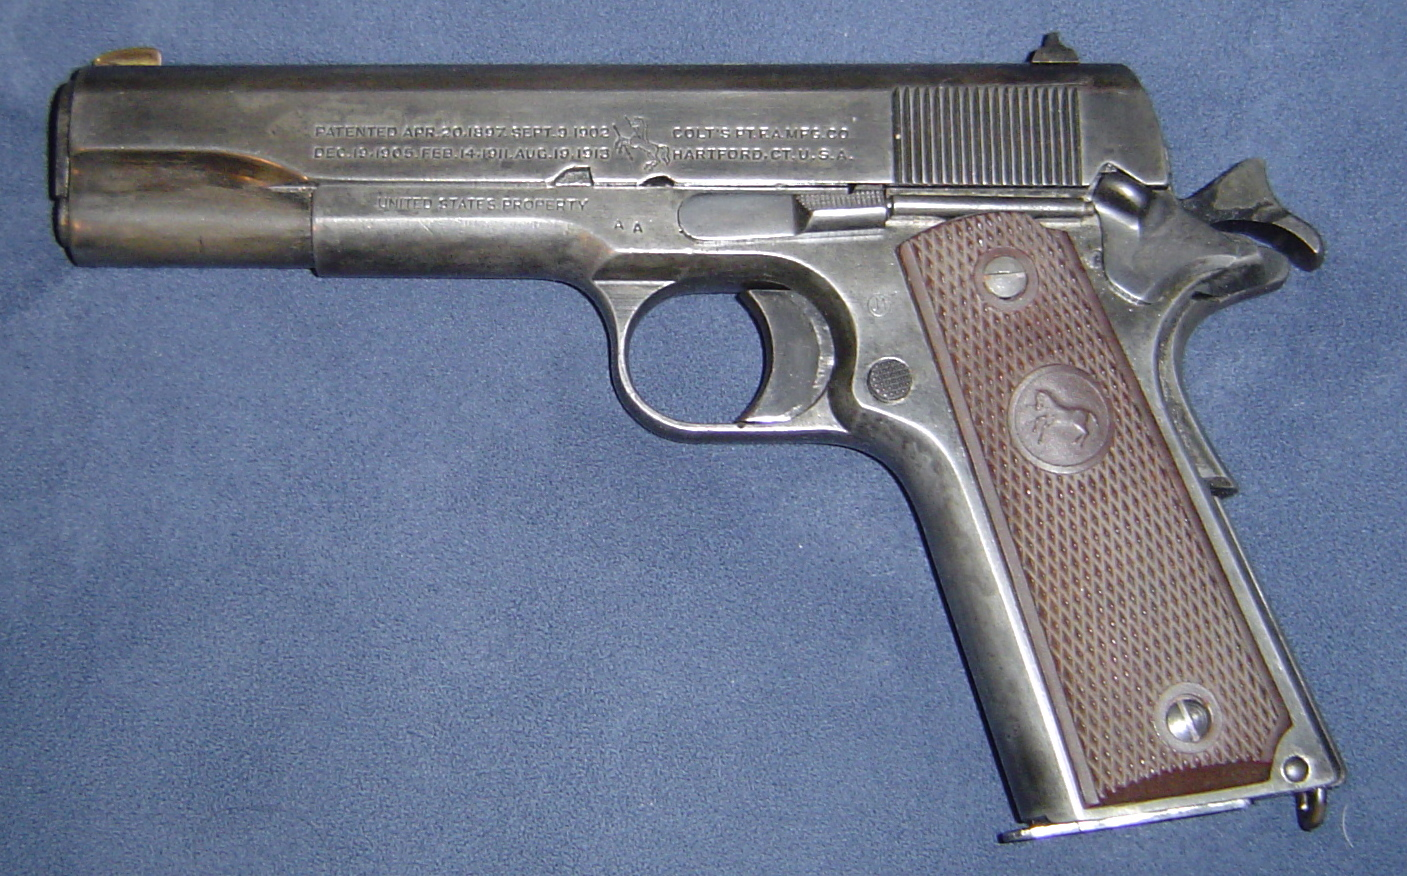 Having fun with my Colt 1911-dsc00630.jpg